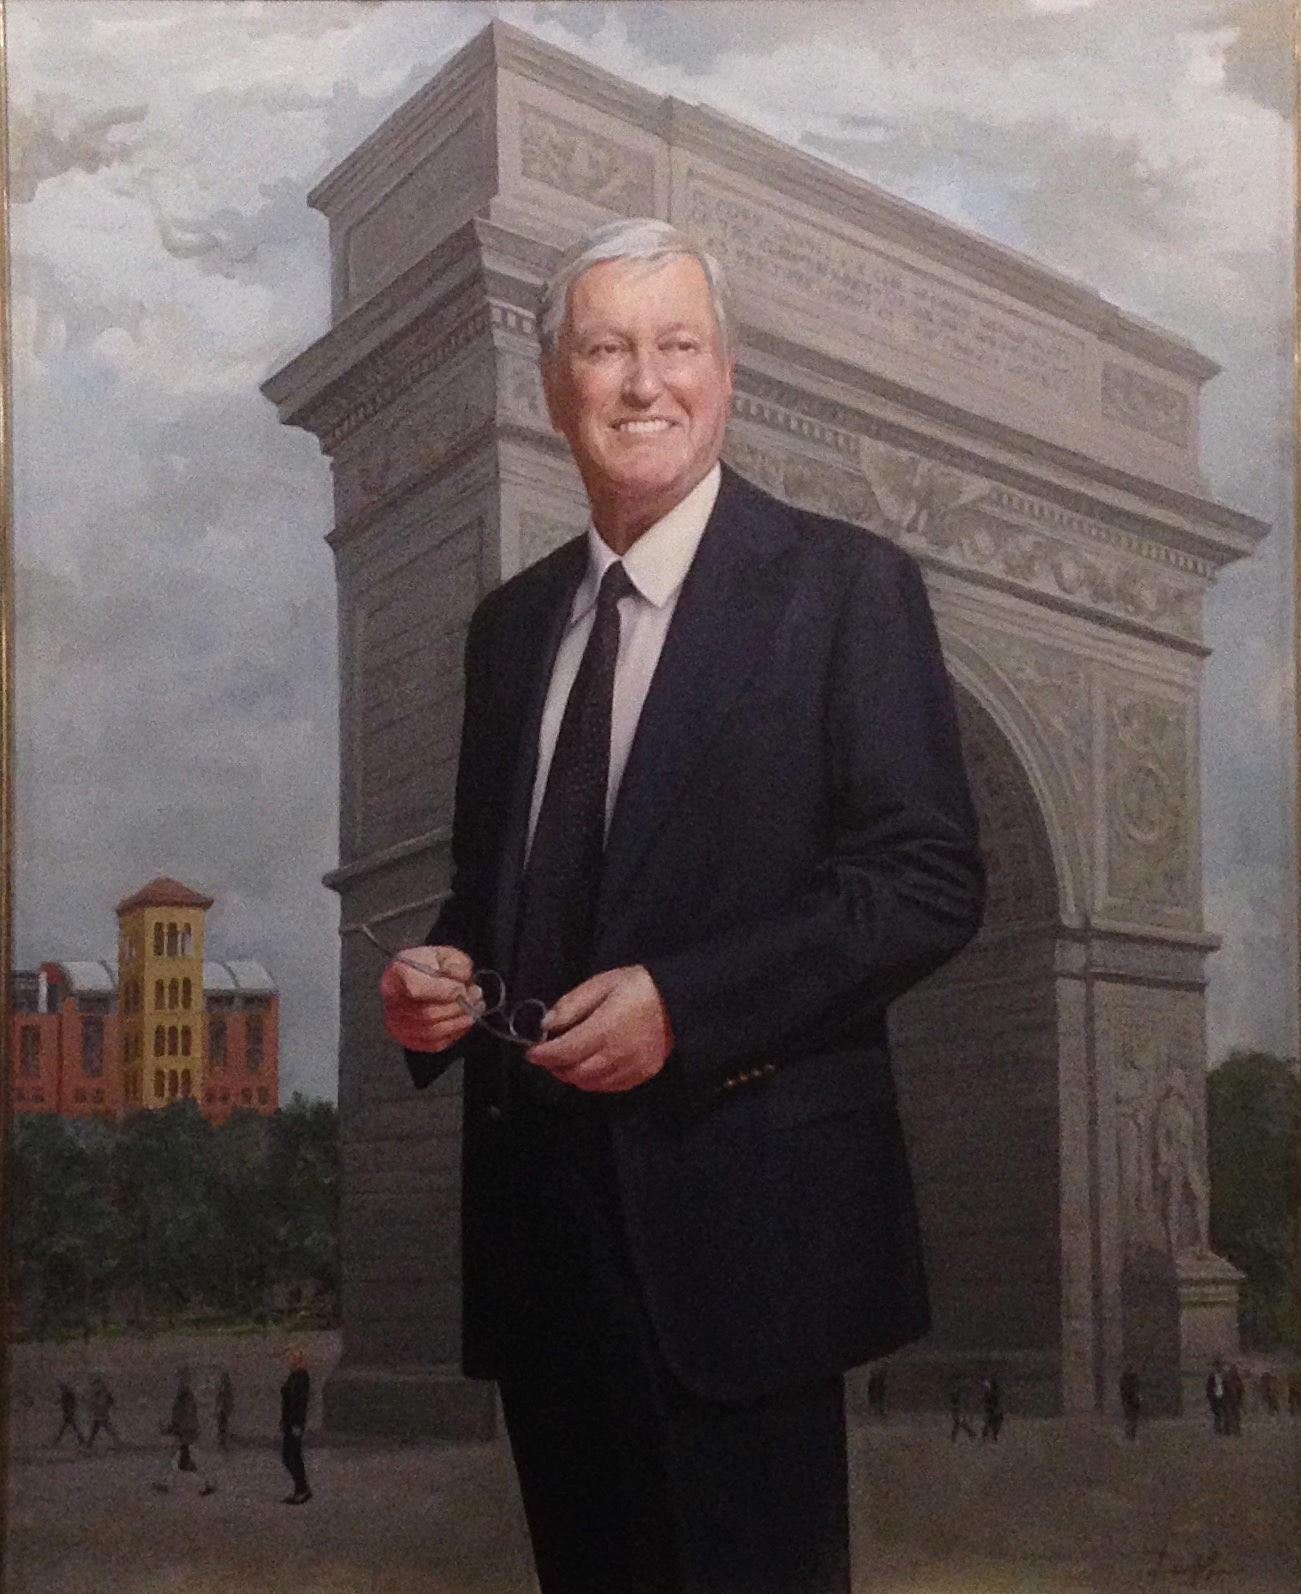 Jay Furman, Trustee